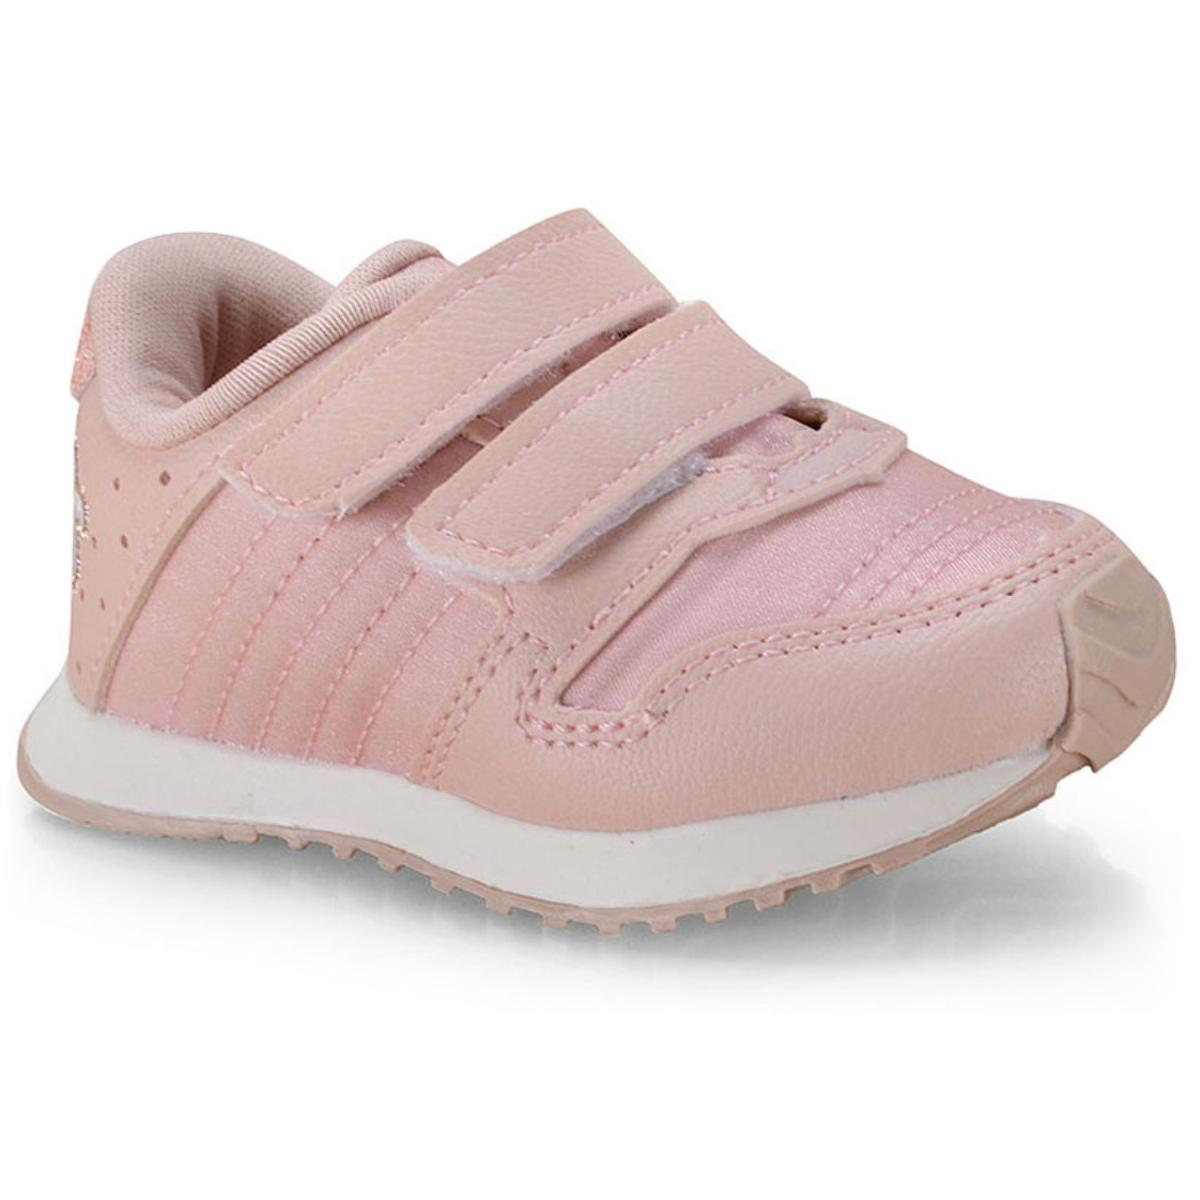 Tênis Fem Infantil Klin 453.051 Rosa Bebê